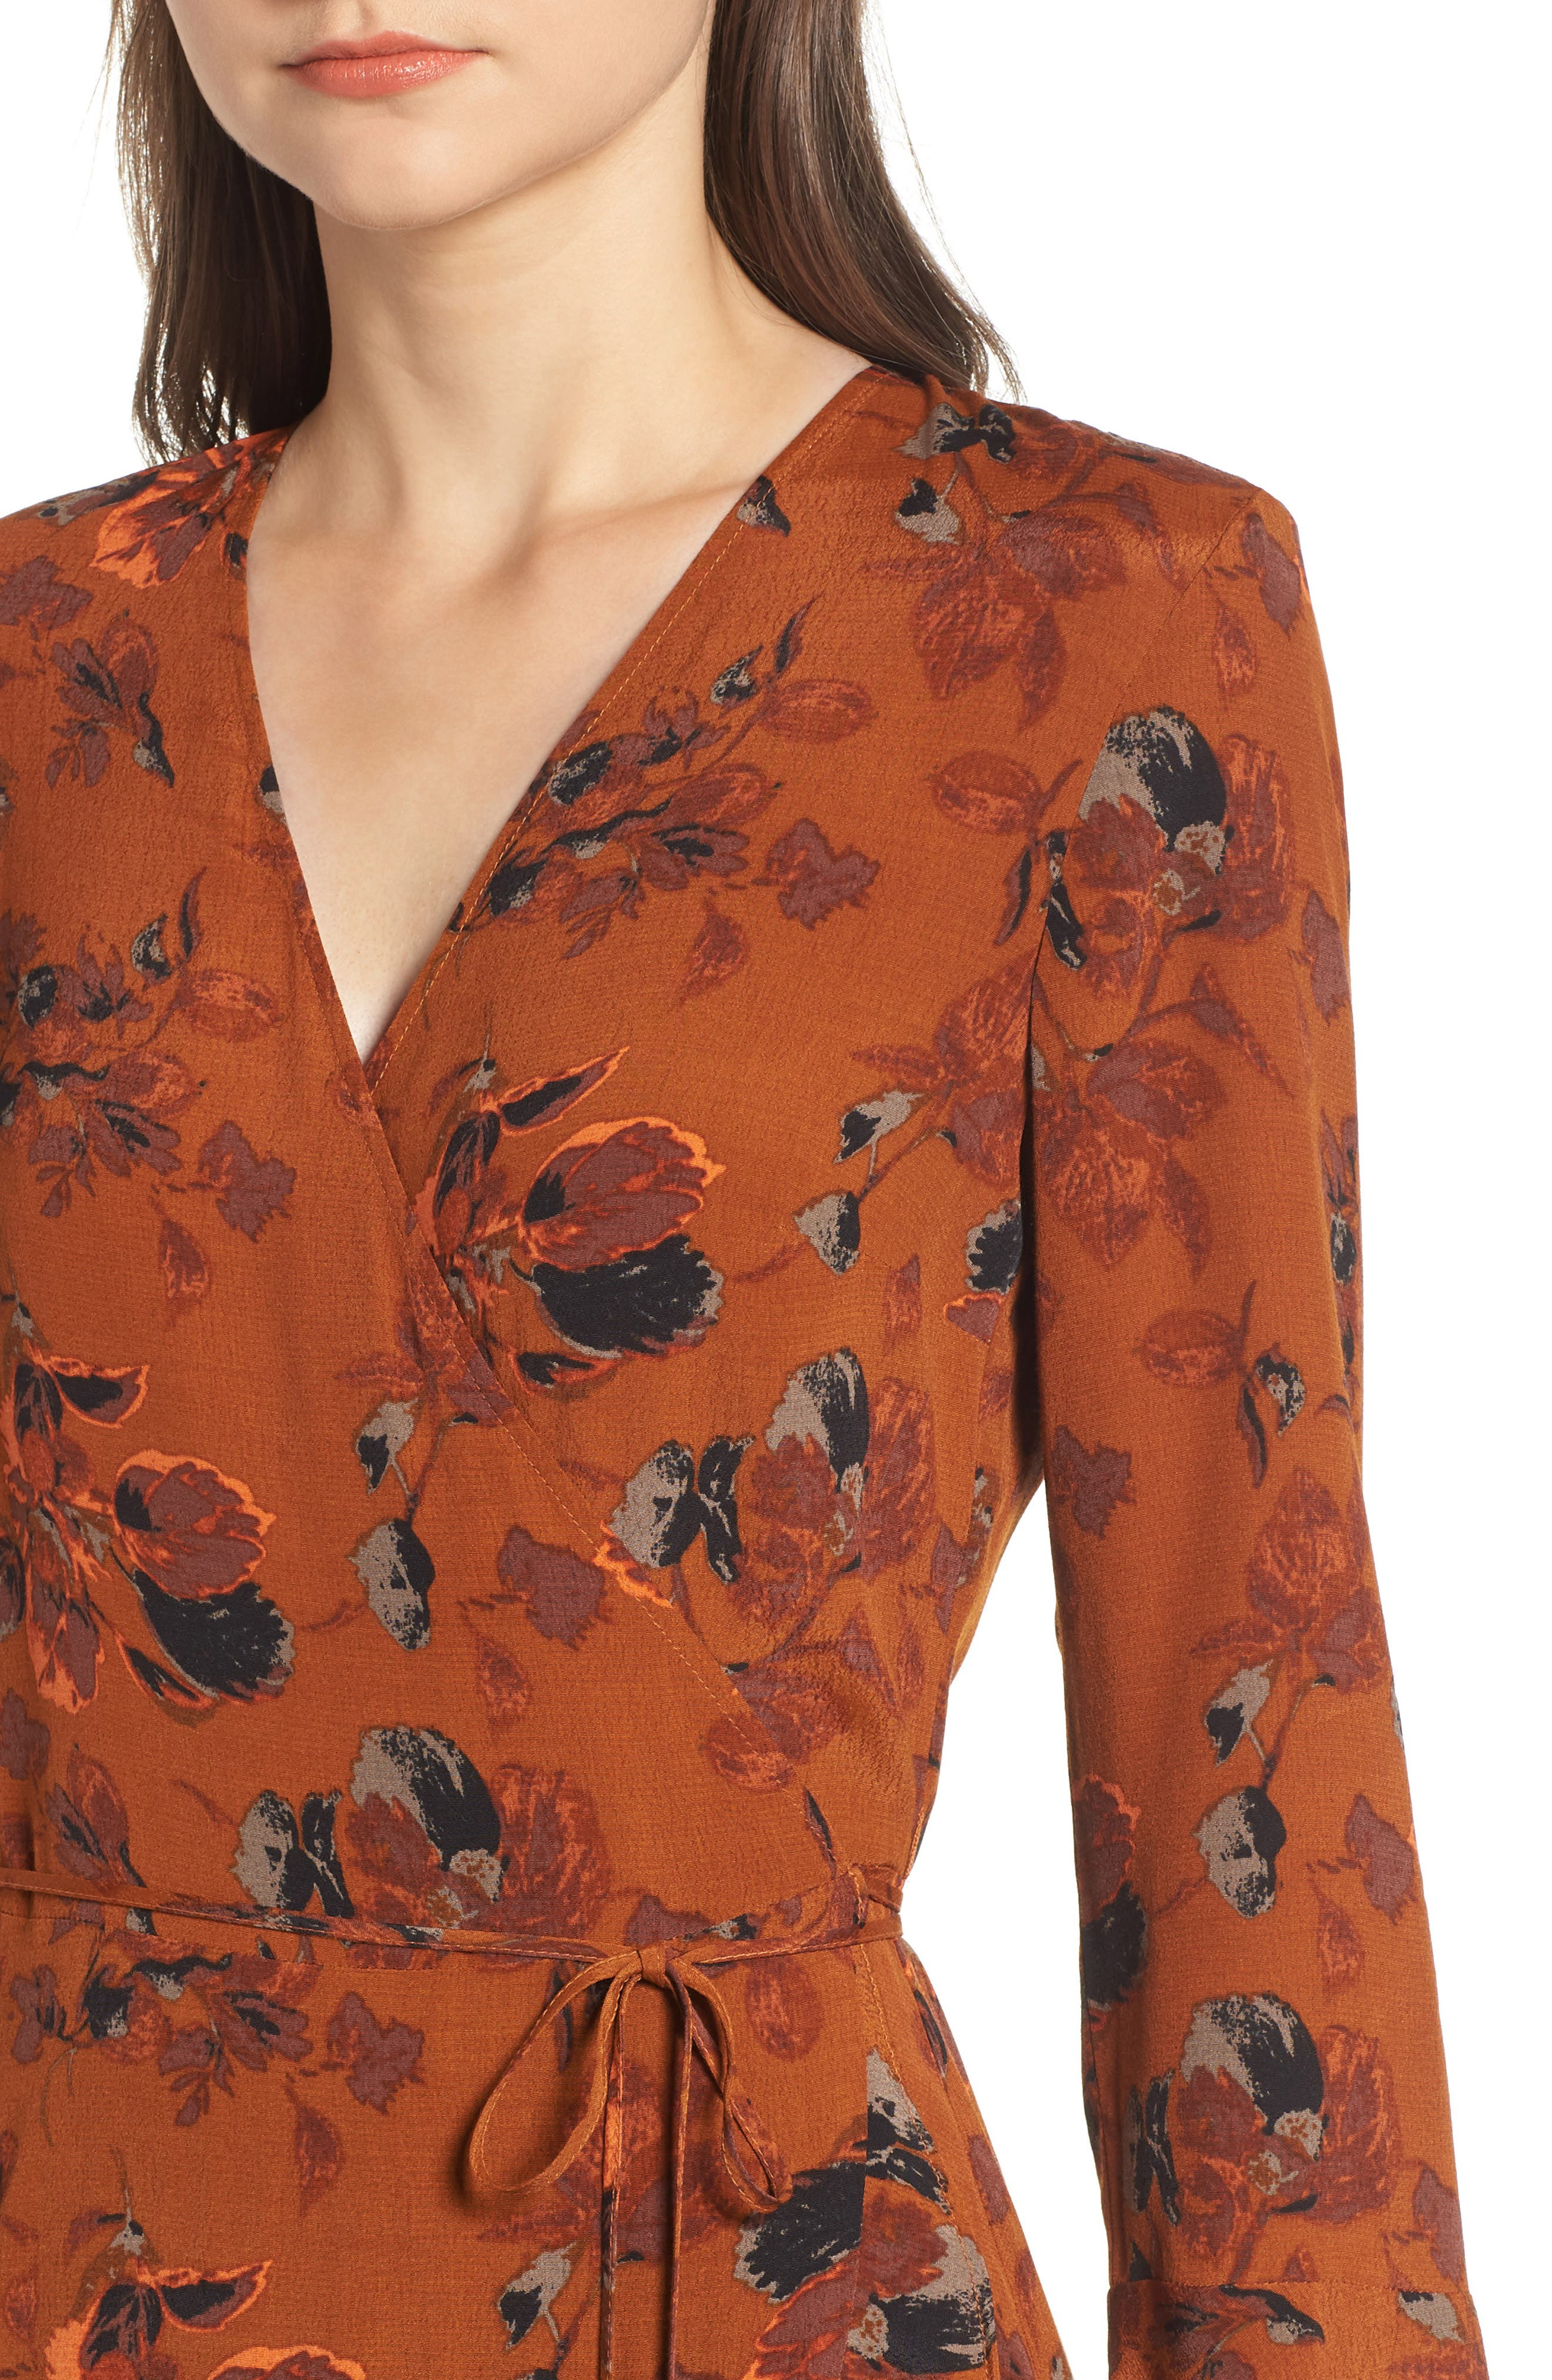 Bell Sleeve Wrap Midi Dress,                             Alternate thumbnail 4, color,                             RUST CARMEL FALL FOLIAGE